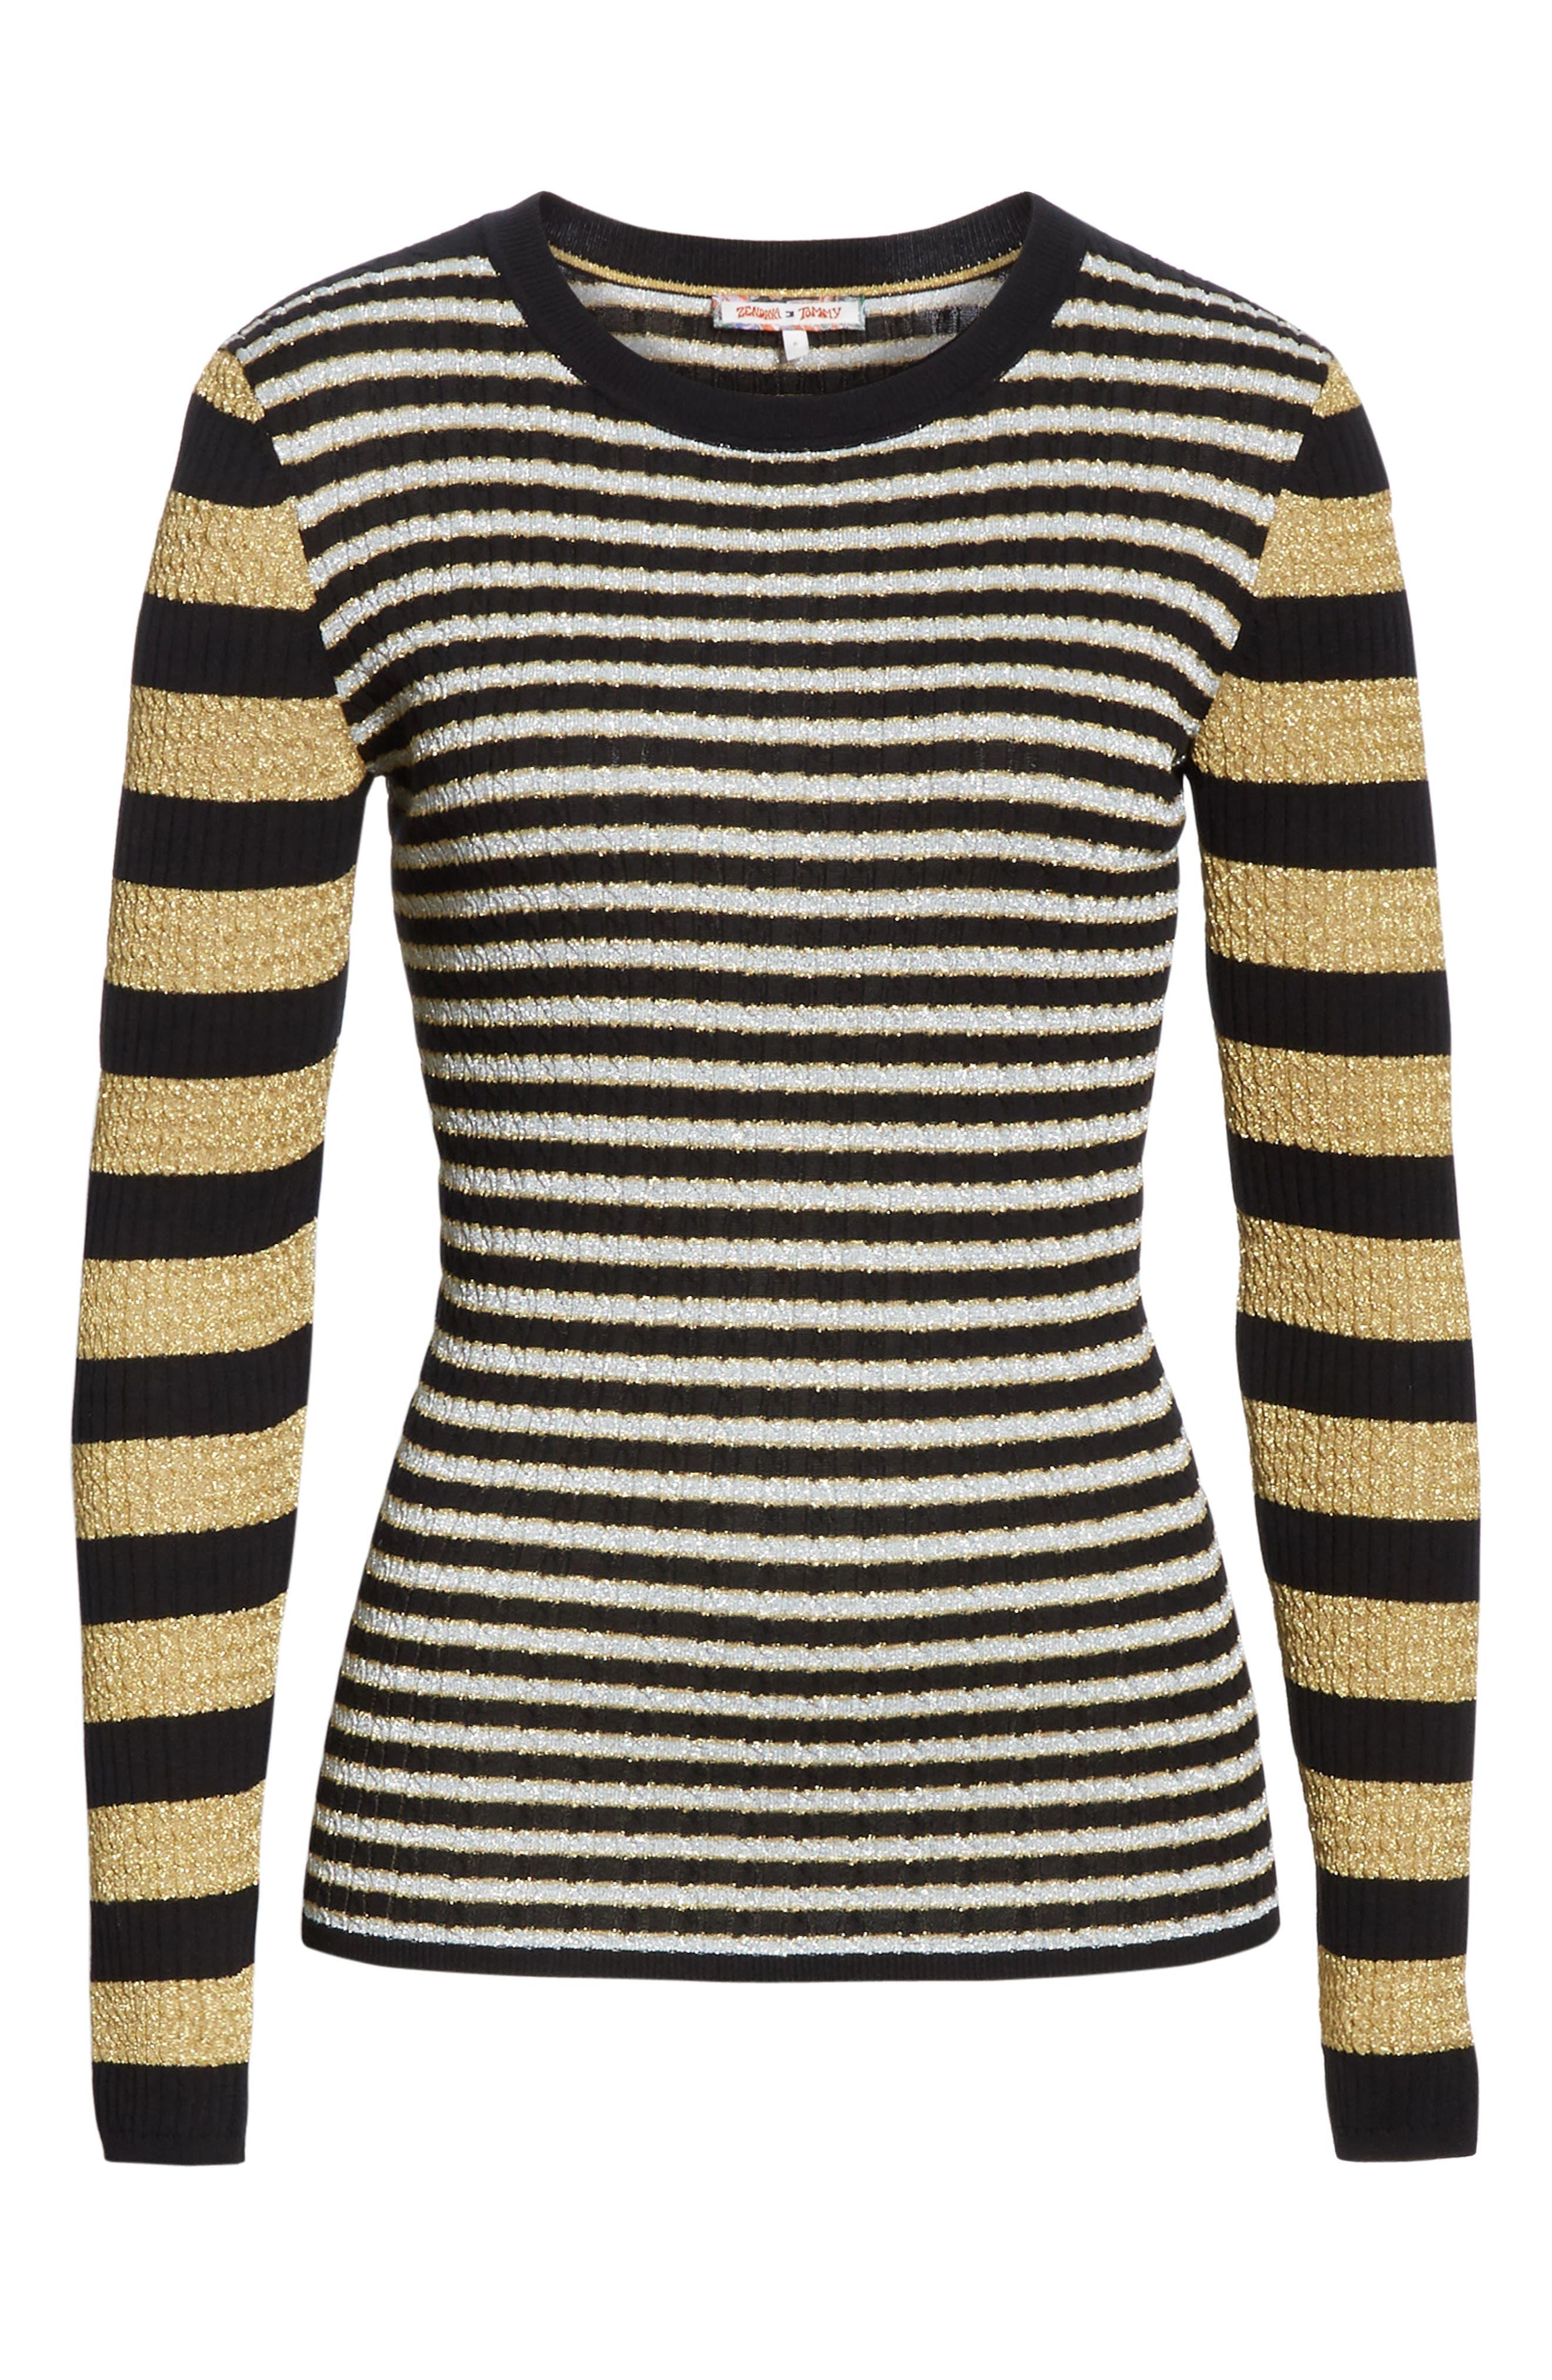 TOMMY X ZENDAYA, Metallic Stripe Knit Top, Alternate thumbnail 6, color, BLACK BEAUTY MULTI